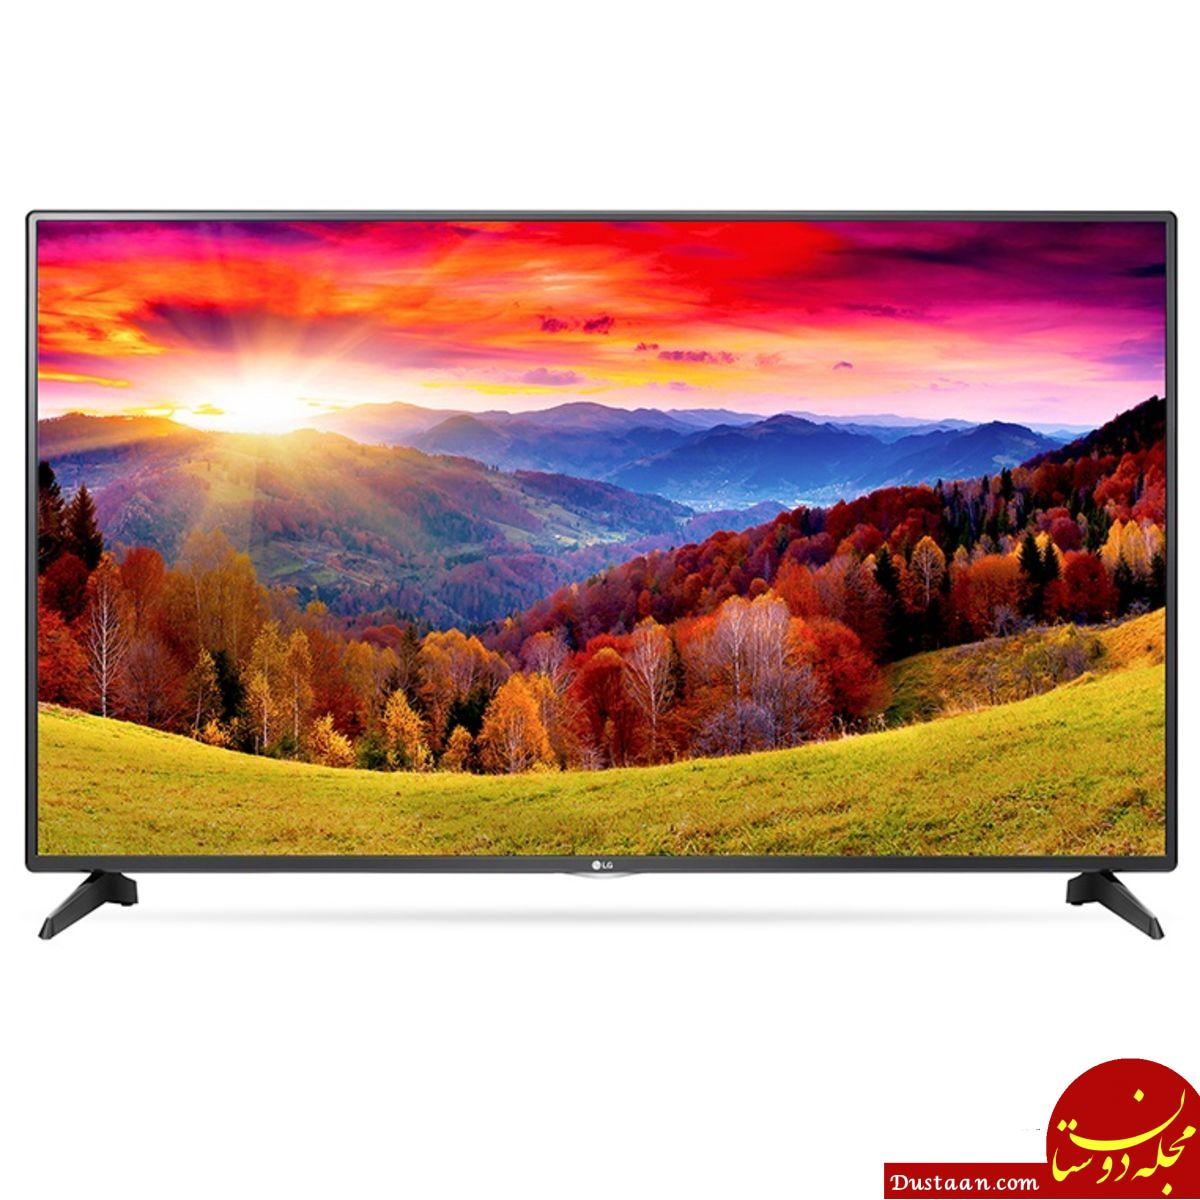 www.dustaan.com قیمت انواع تلویزیون در بازار های تهران (LG   SAMSUNG   SONY)